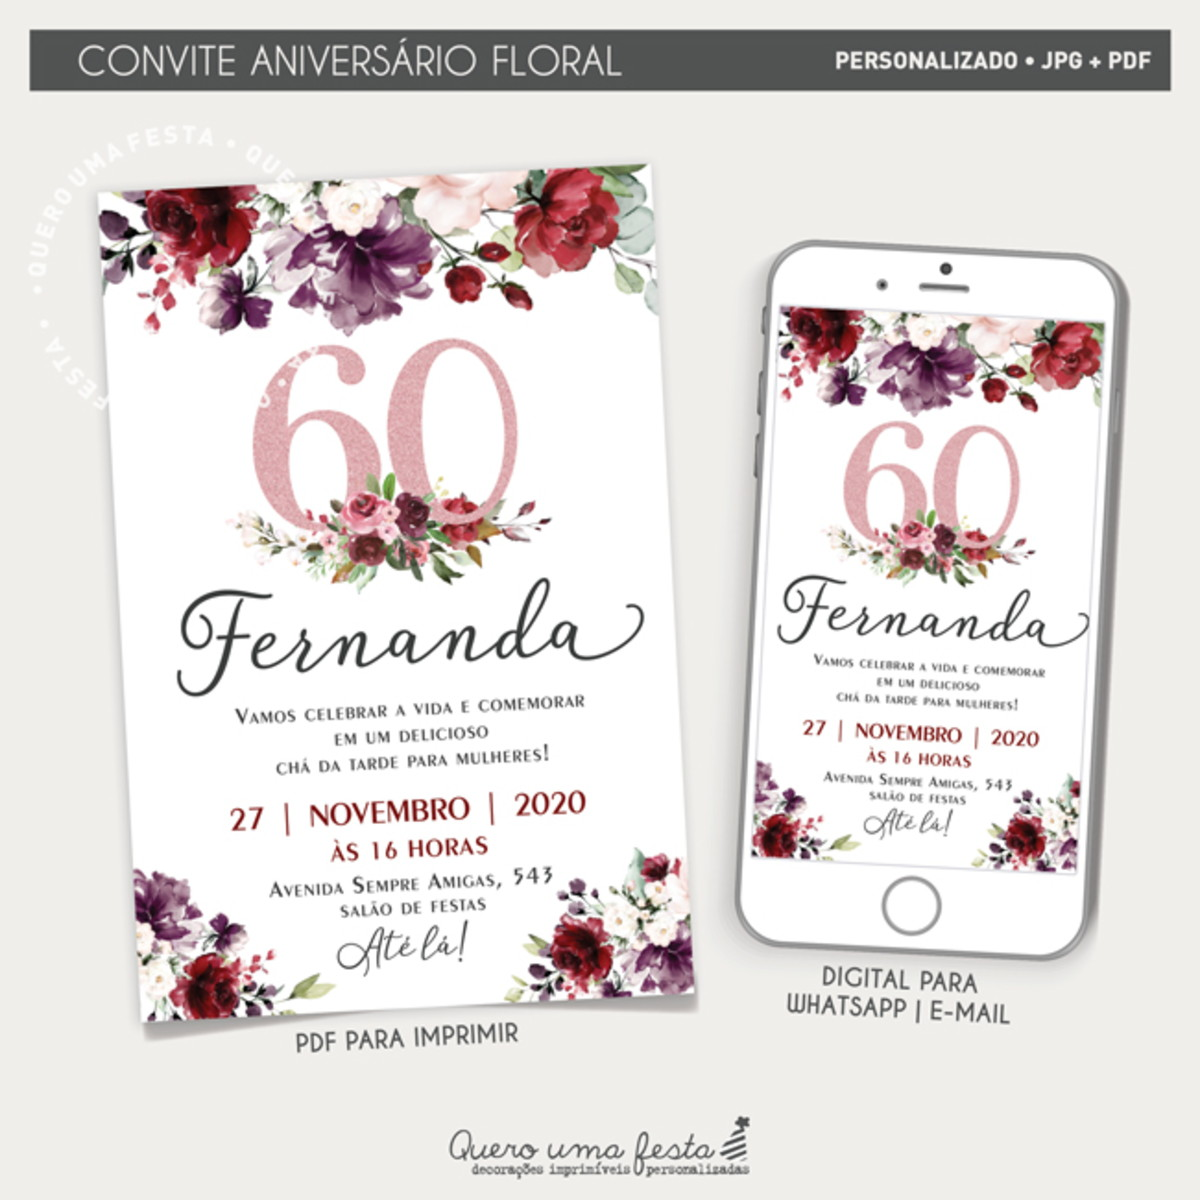 Convite Aniversario Floral Digital No Elo7 Quero Uma Festa